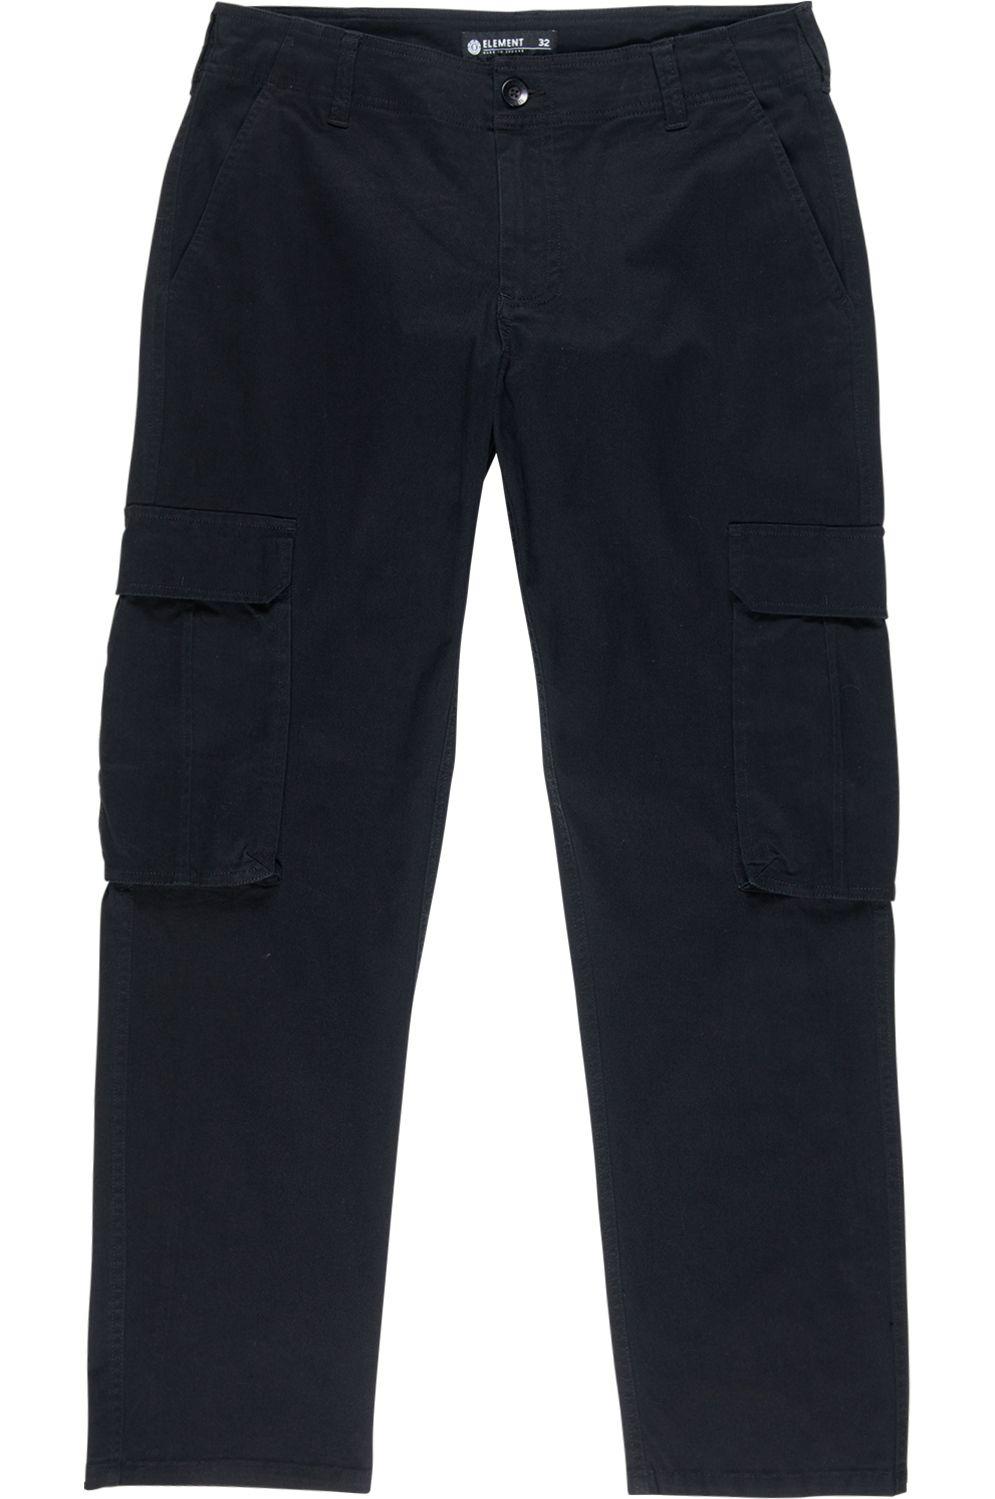 Element Pants FORT CARGO Flint Black